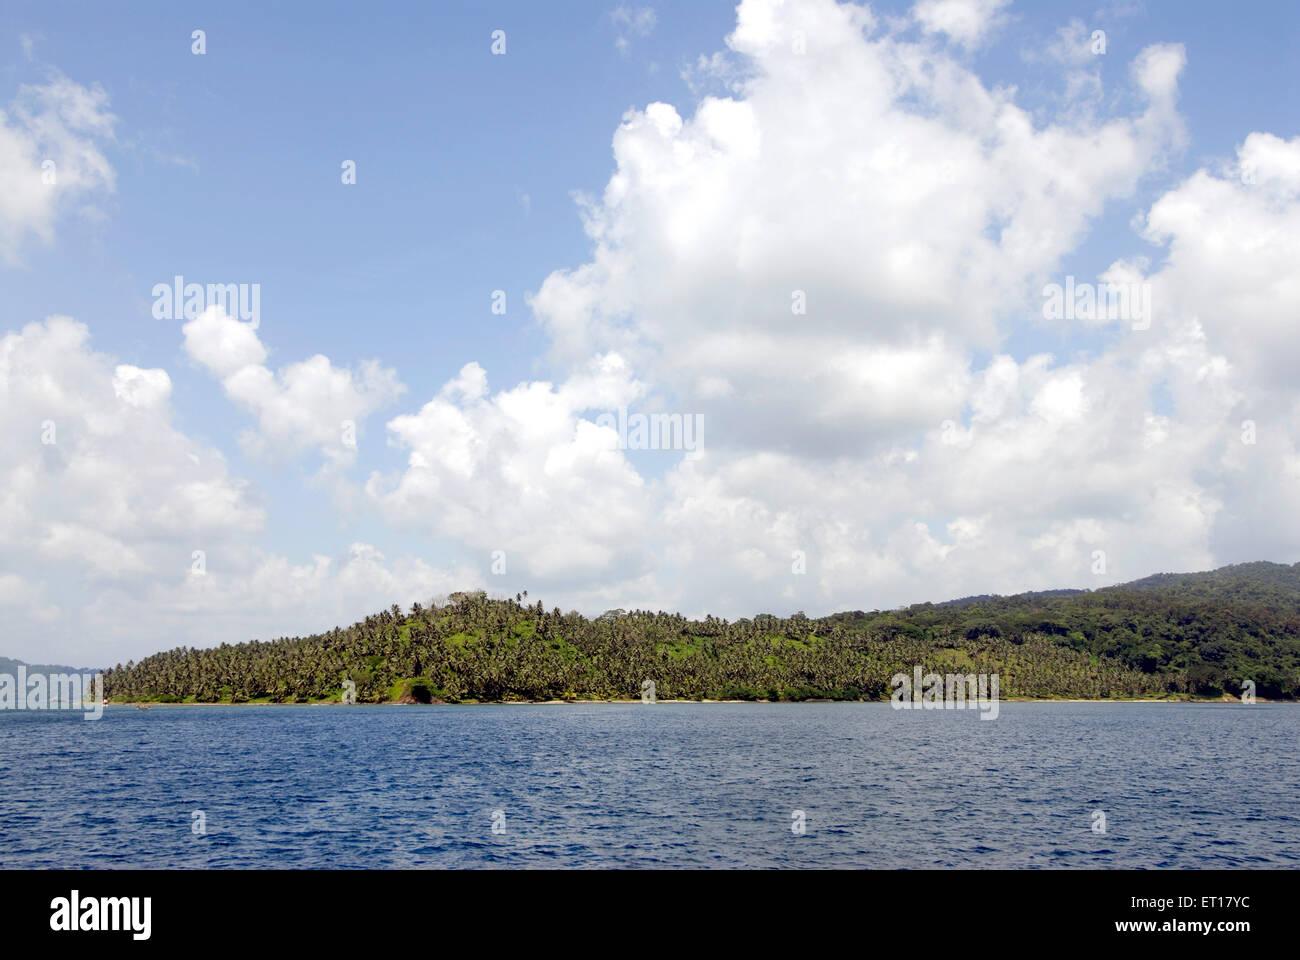 Jolly boa o isole pellerossa ; a sud delle Isole Andamane ; Baia del Bengala ; India Ottobre 2008 Immagini Stock